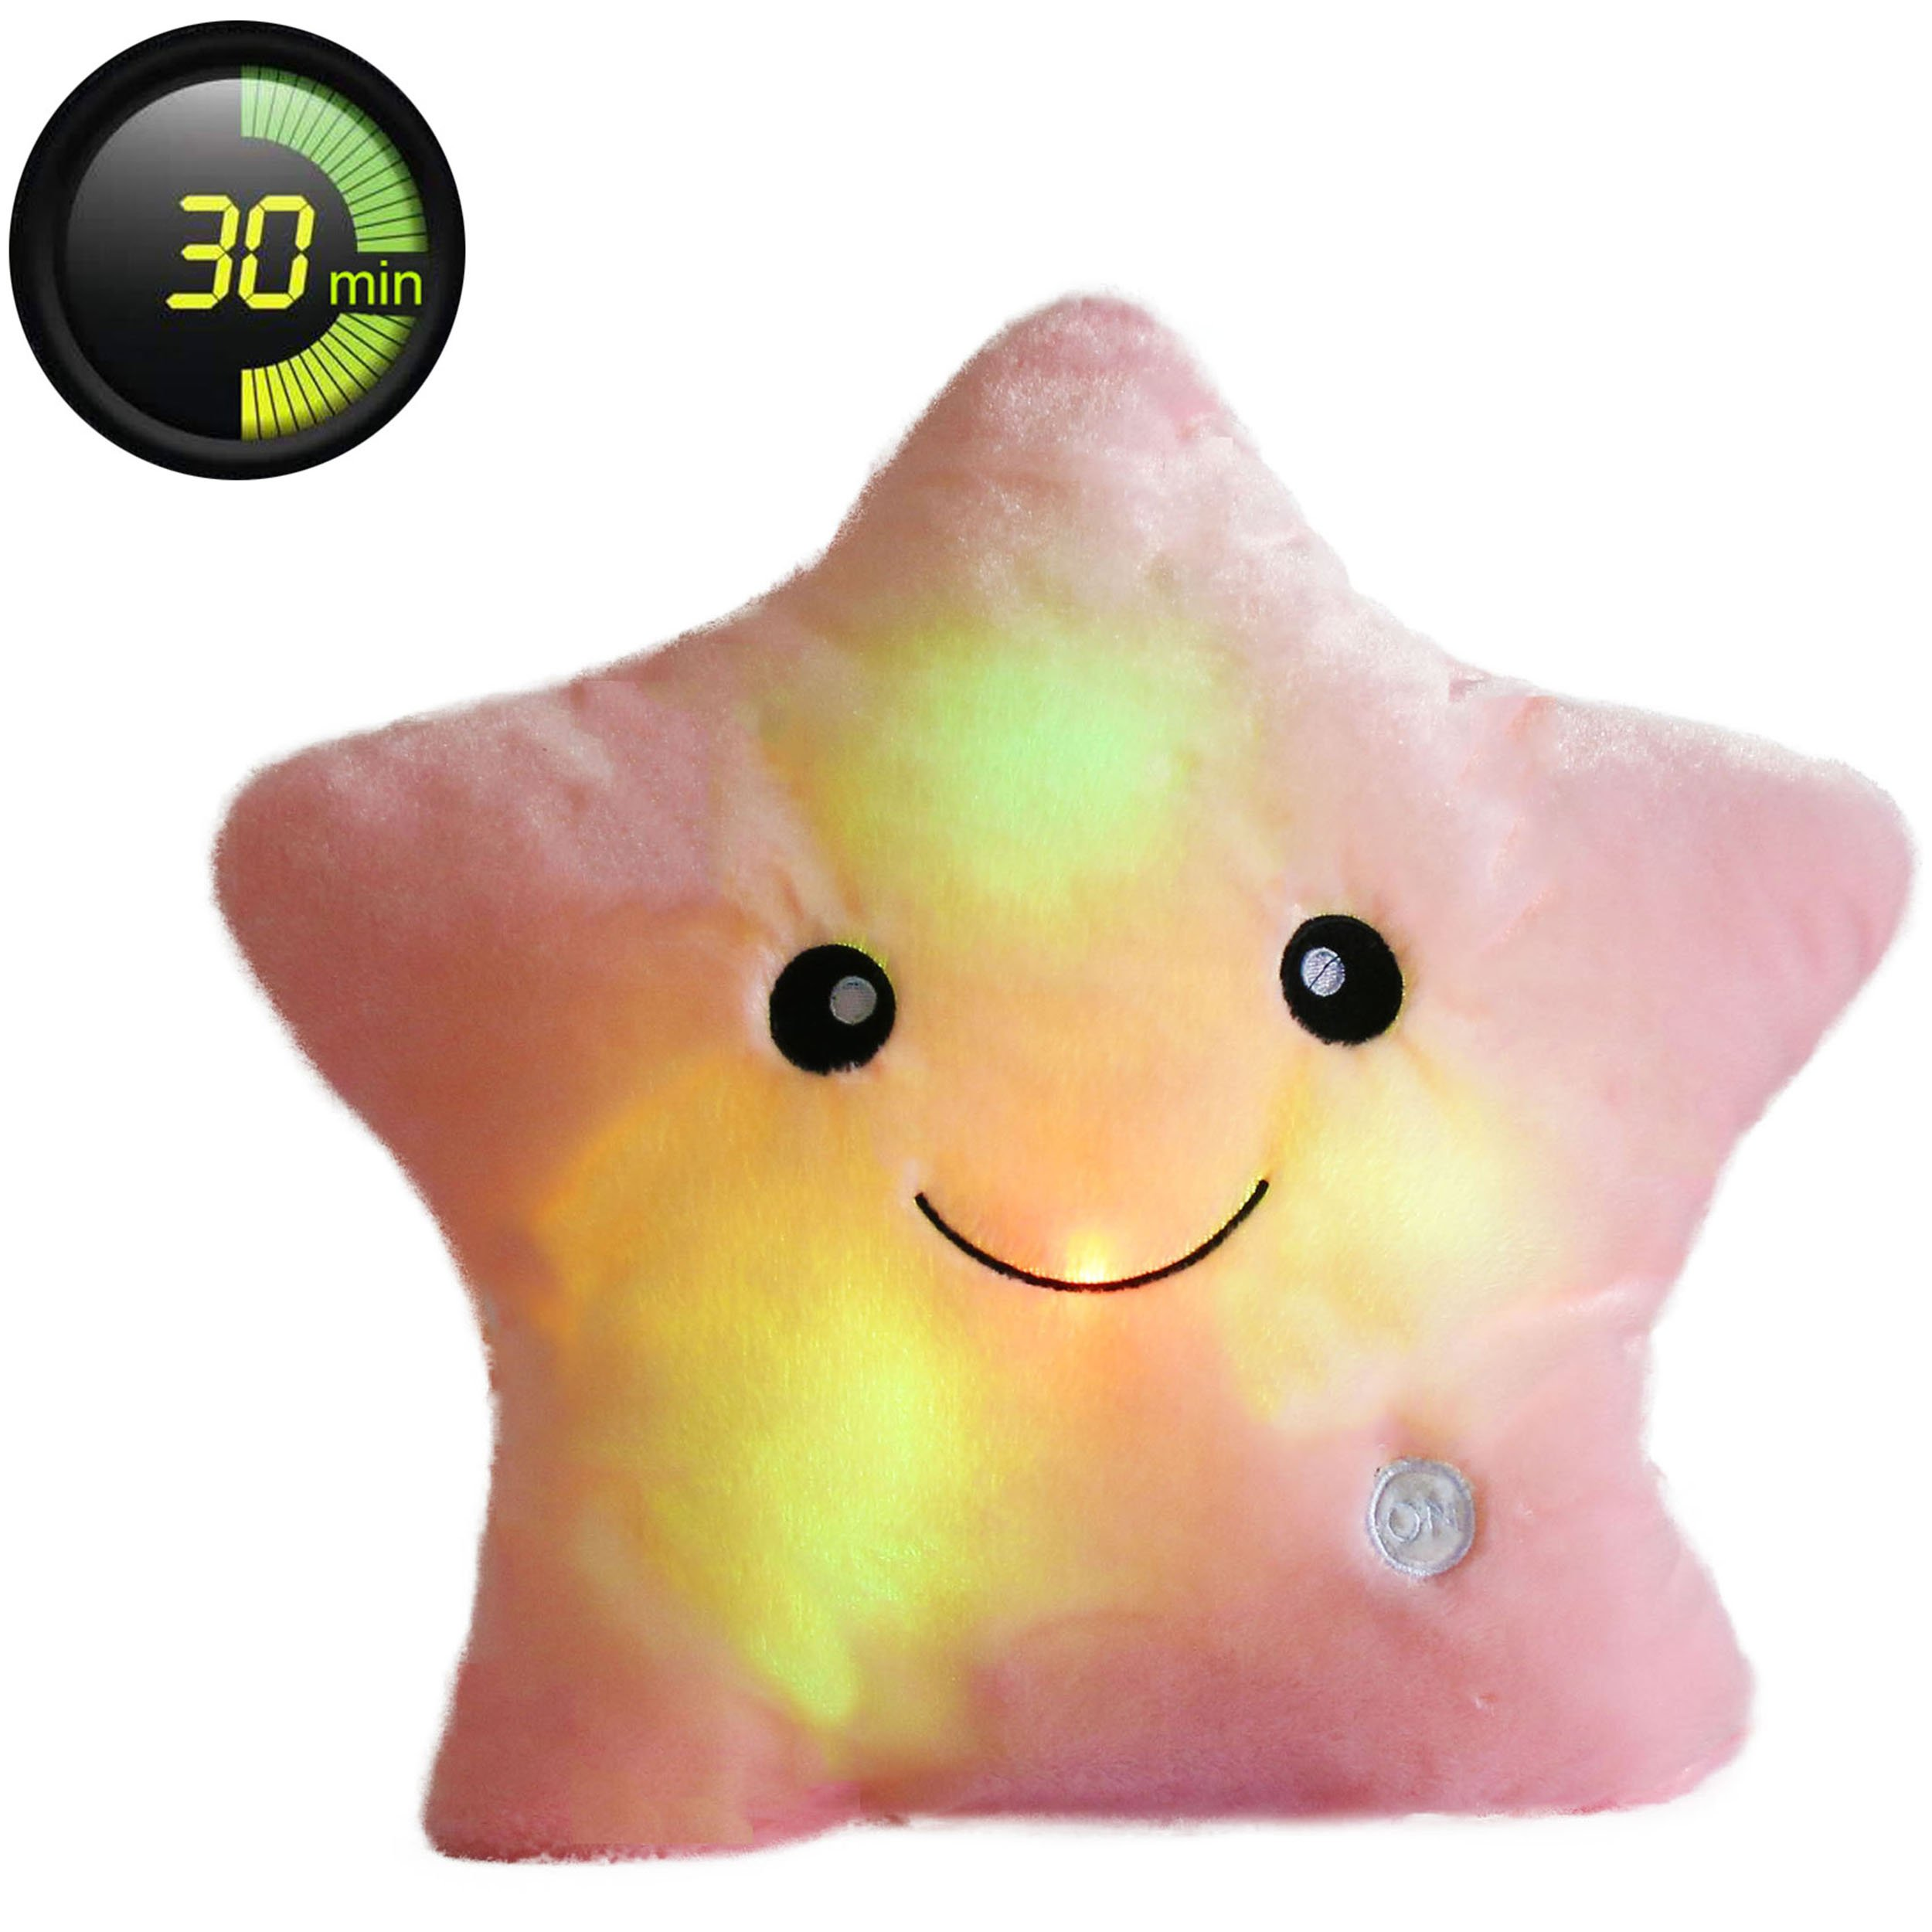 Wewill Creative Twinkle Star Glowing LED Night Light Plush Pillows Stuffed Toys (Pink)